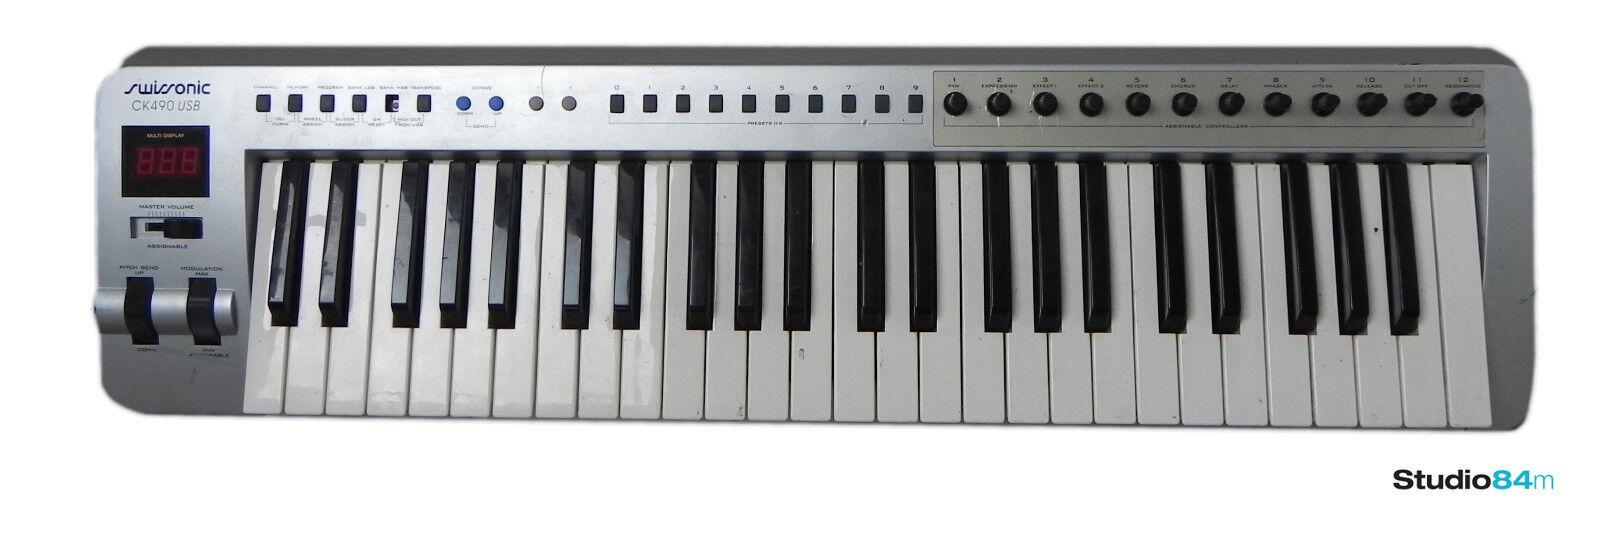 Swissonic ck490 USB Pro Audio keyboard USB MIDI Keyboard Controller